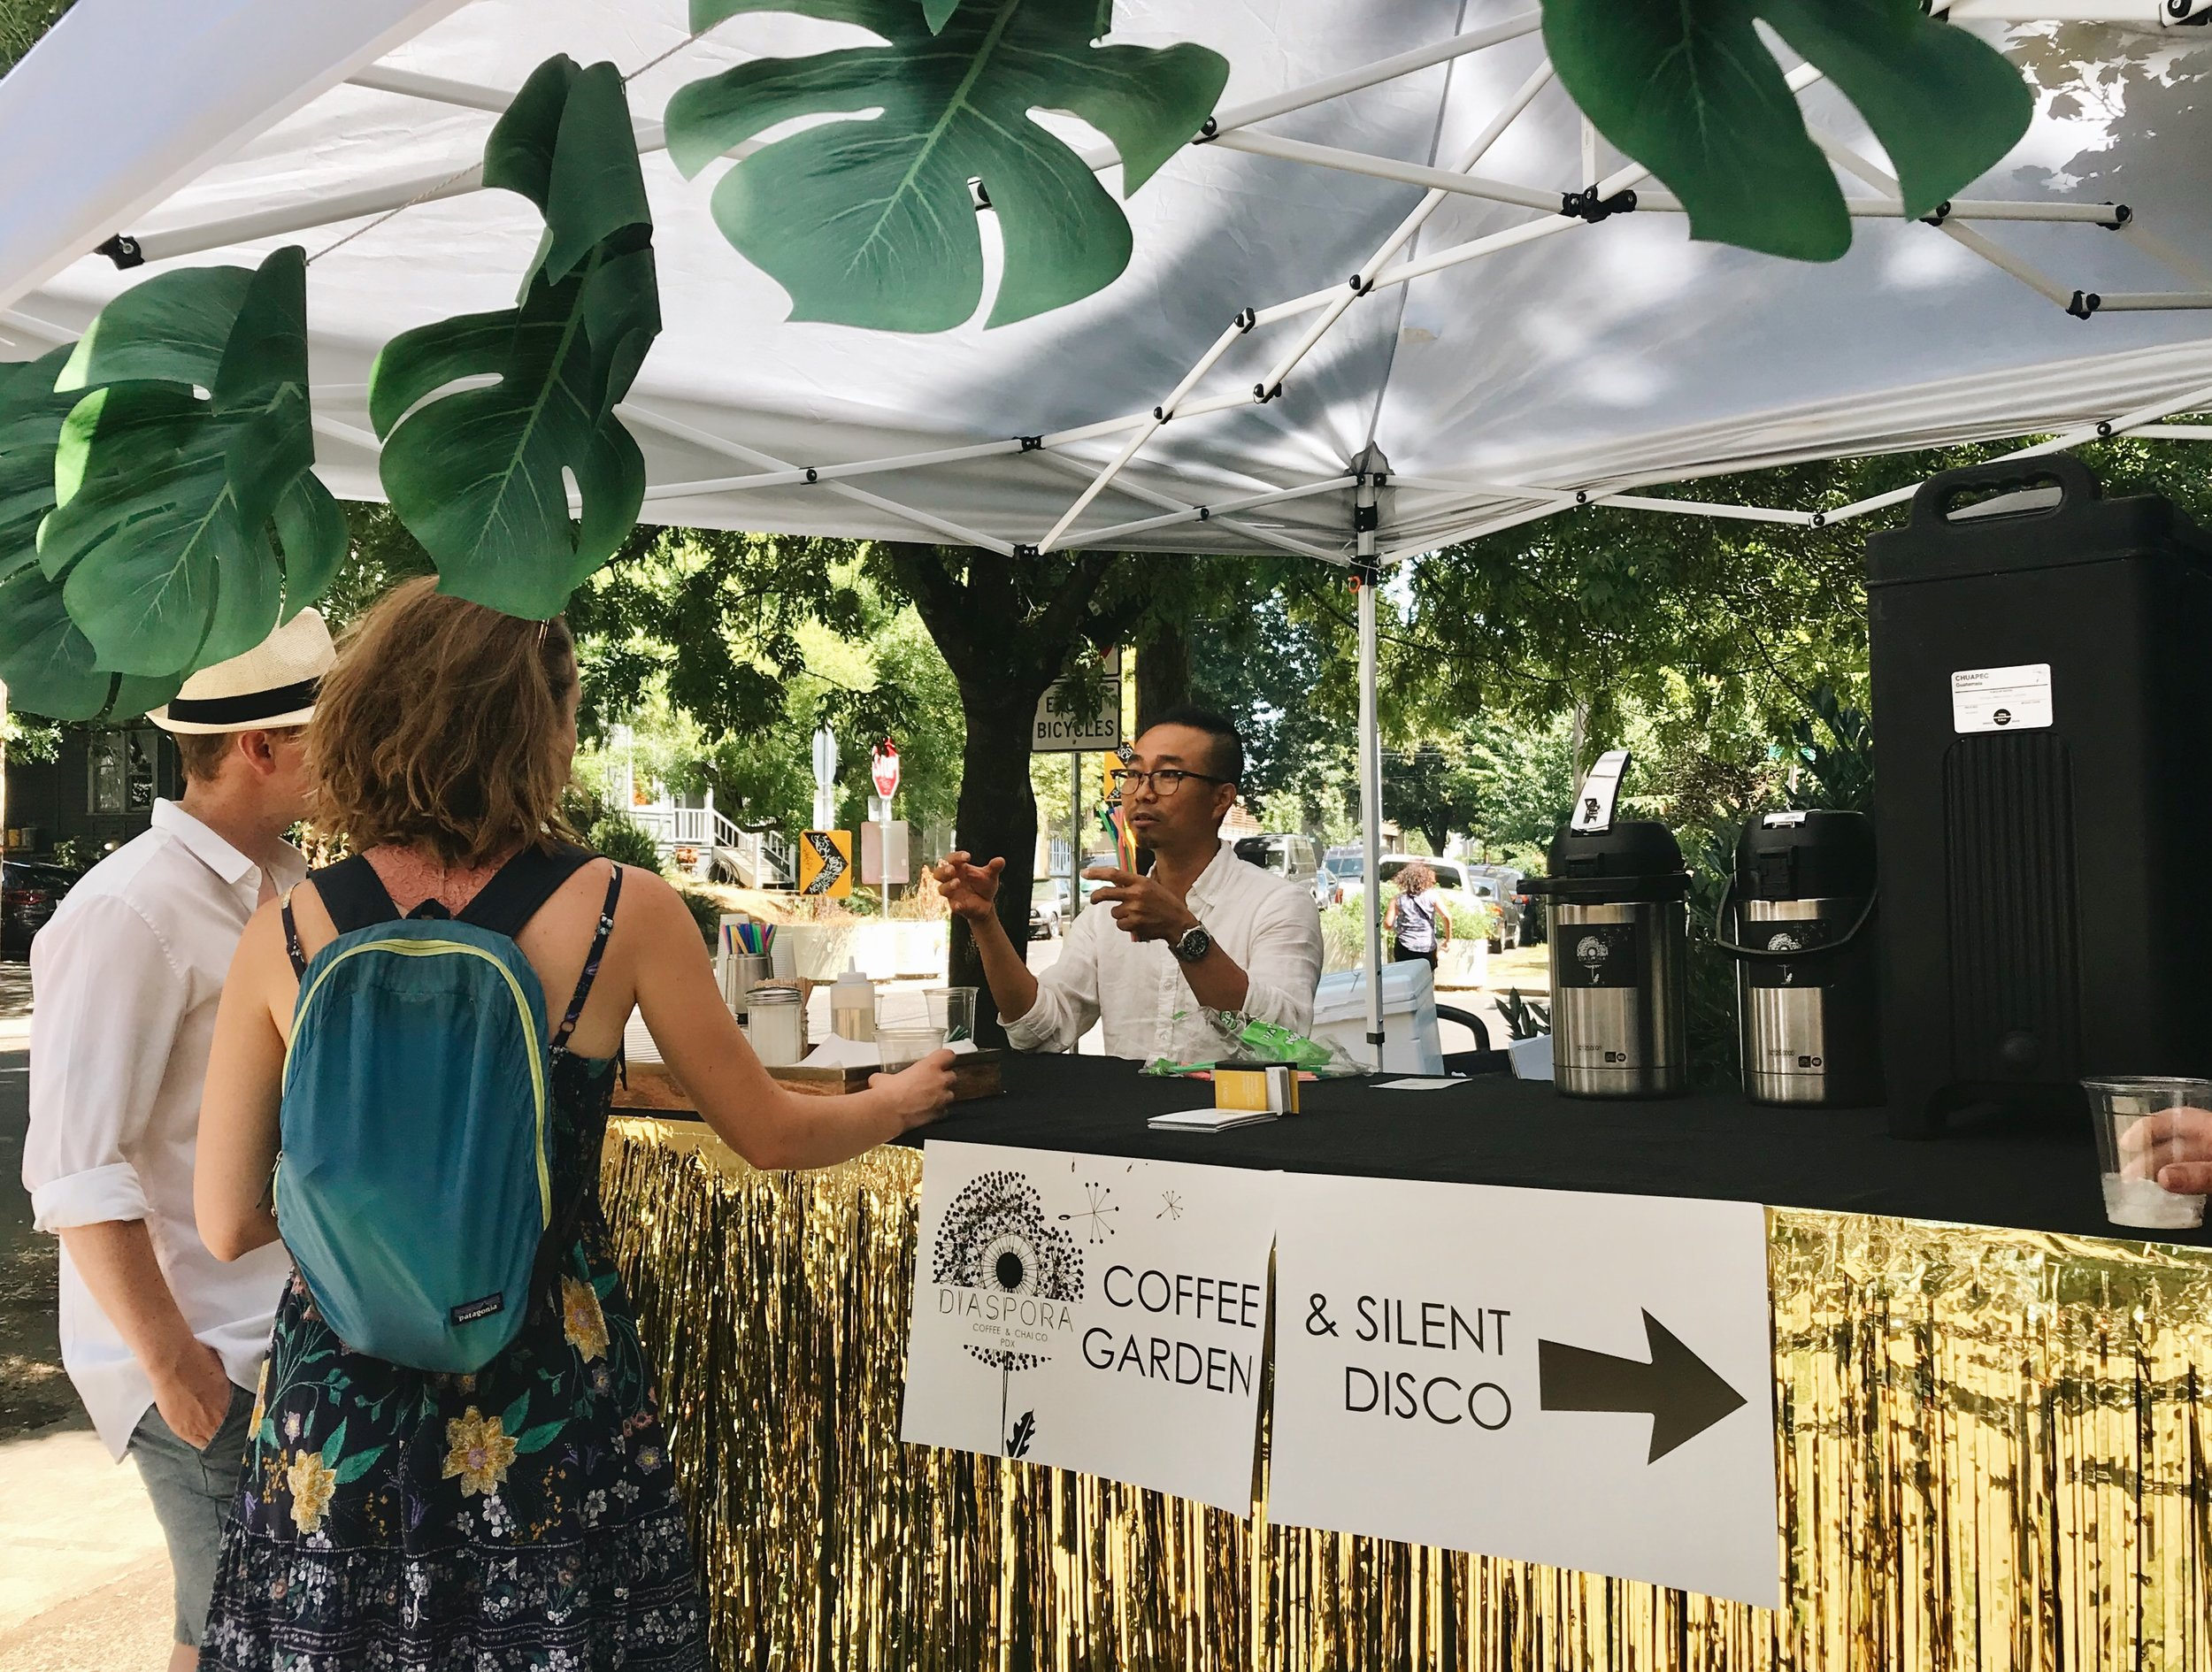 Sam at the Diaspora-hosted coffee garden at Imago Dei's Summer Baptism Festival.